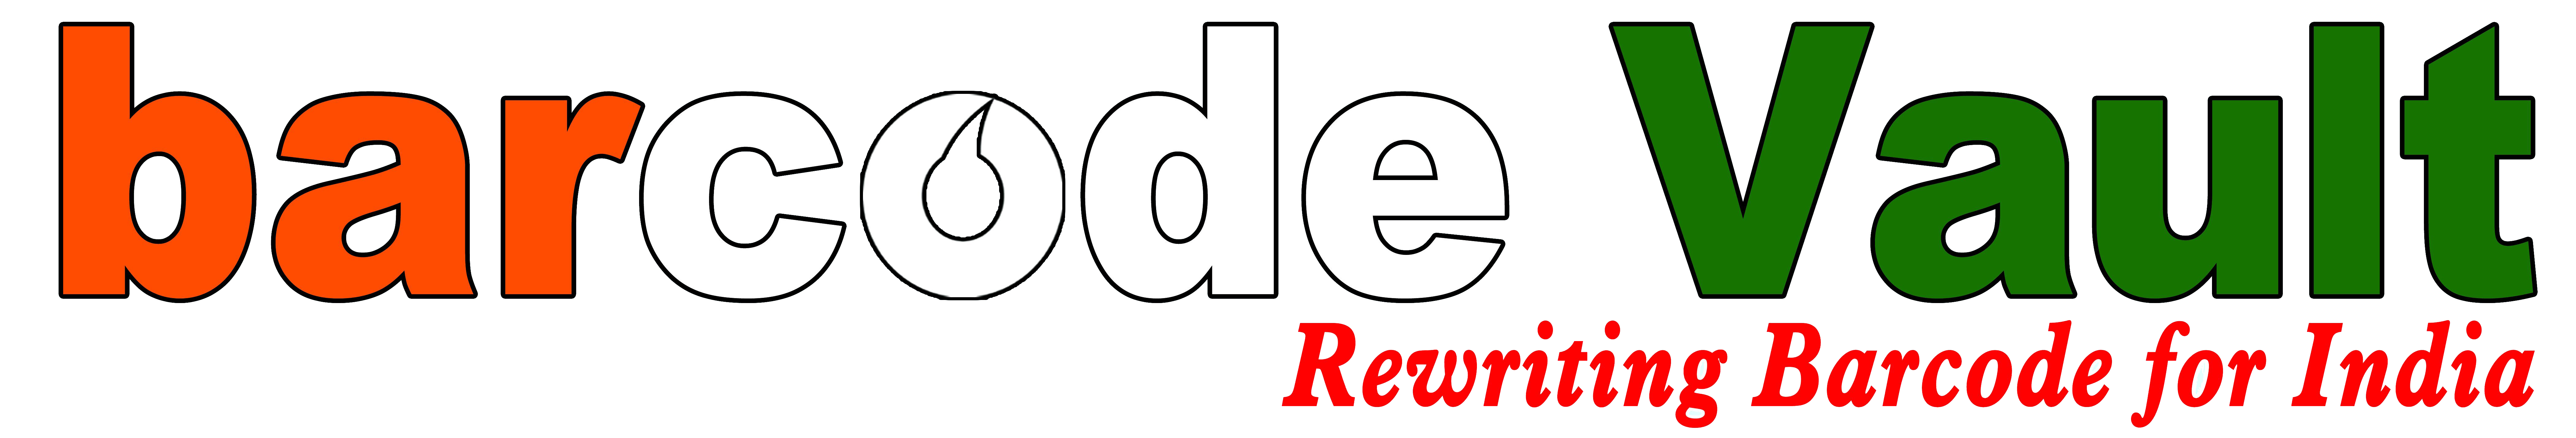 barcodevault_logo